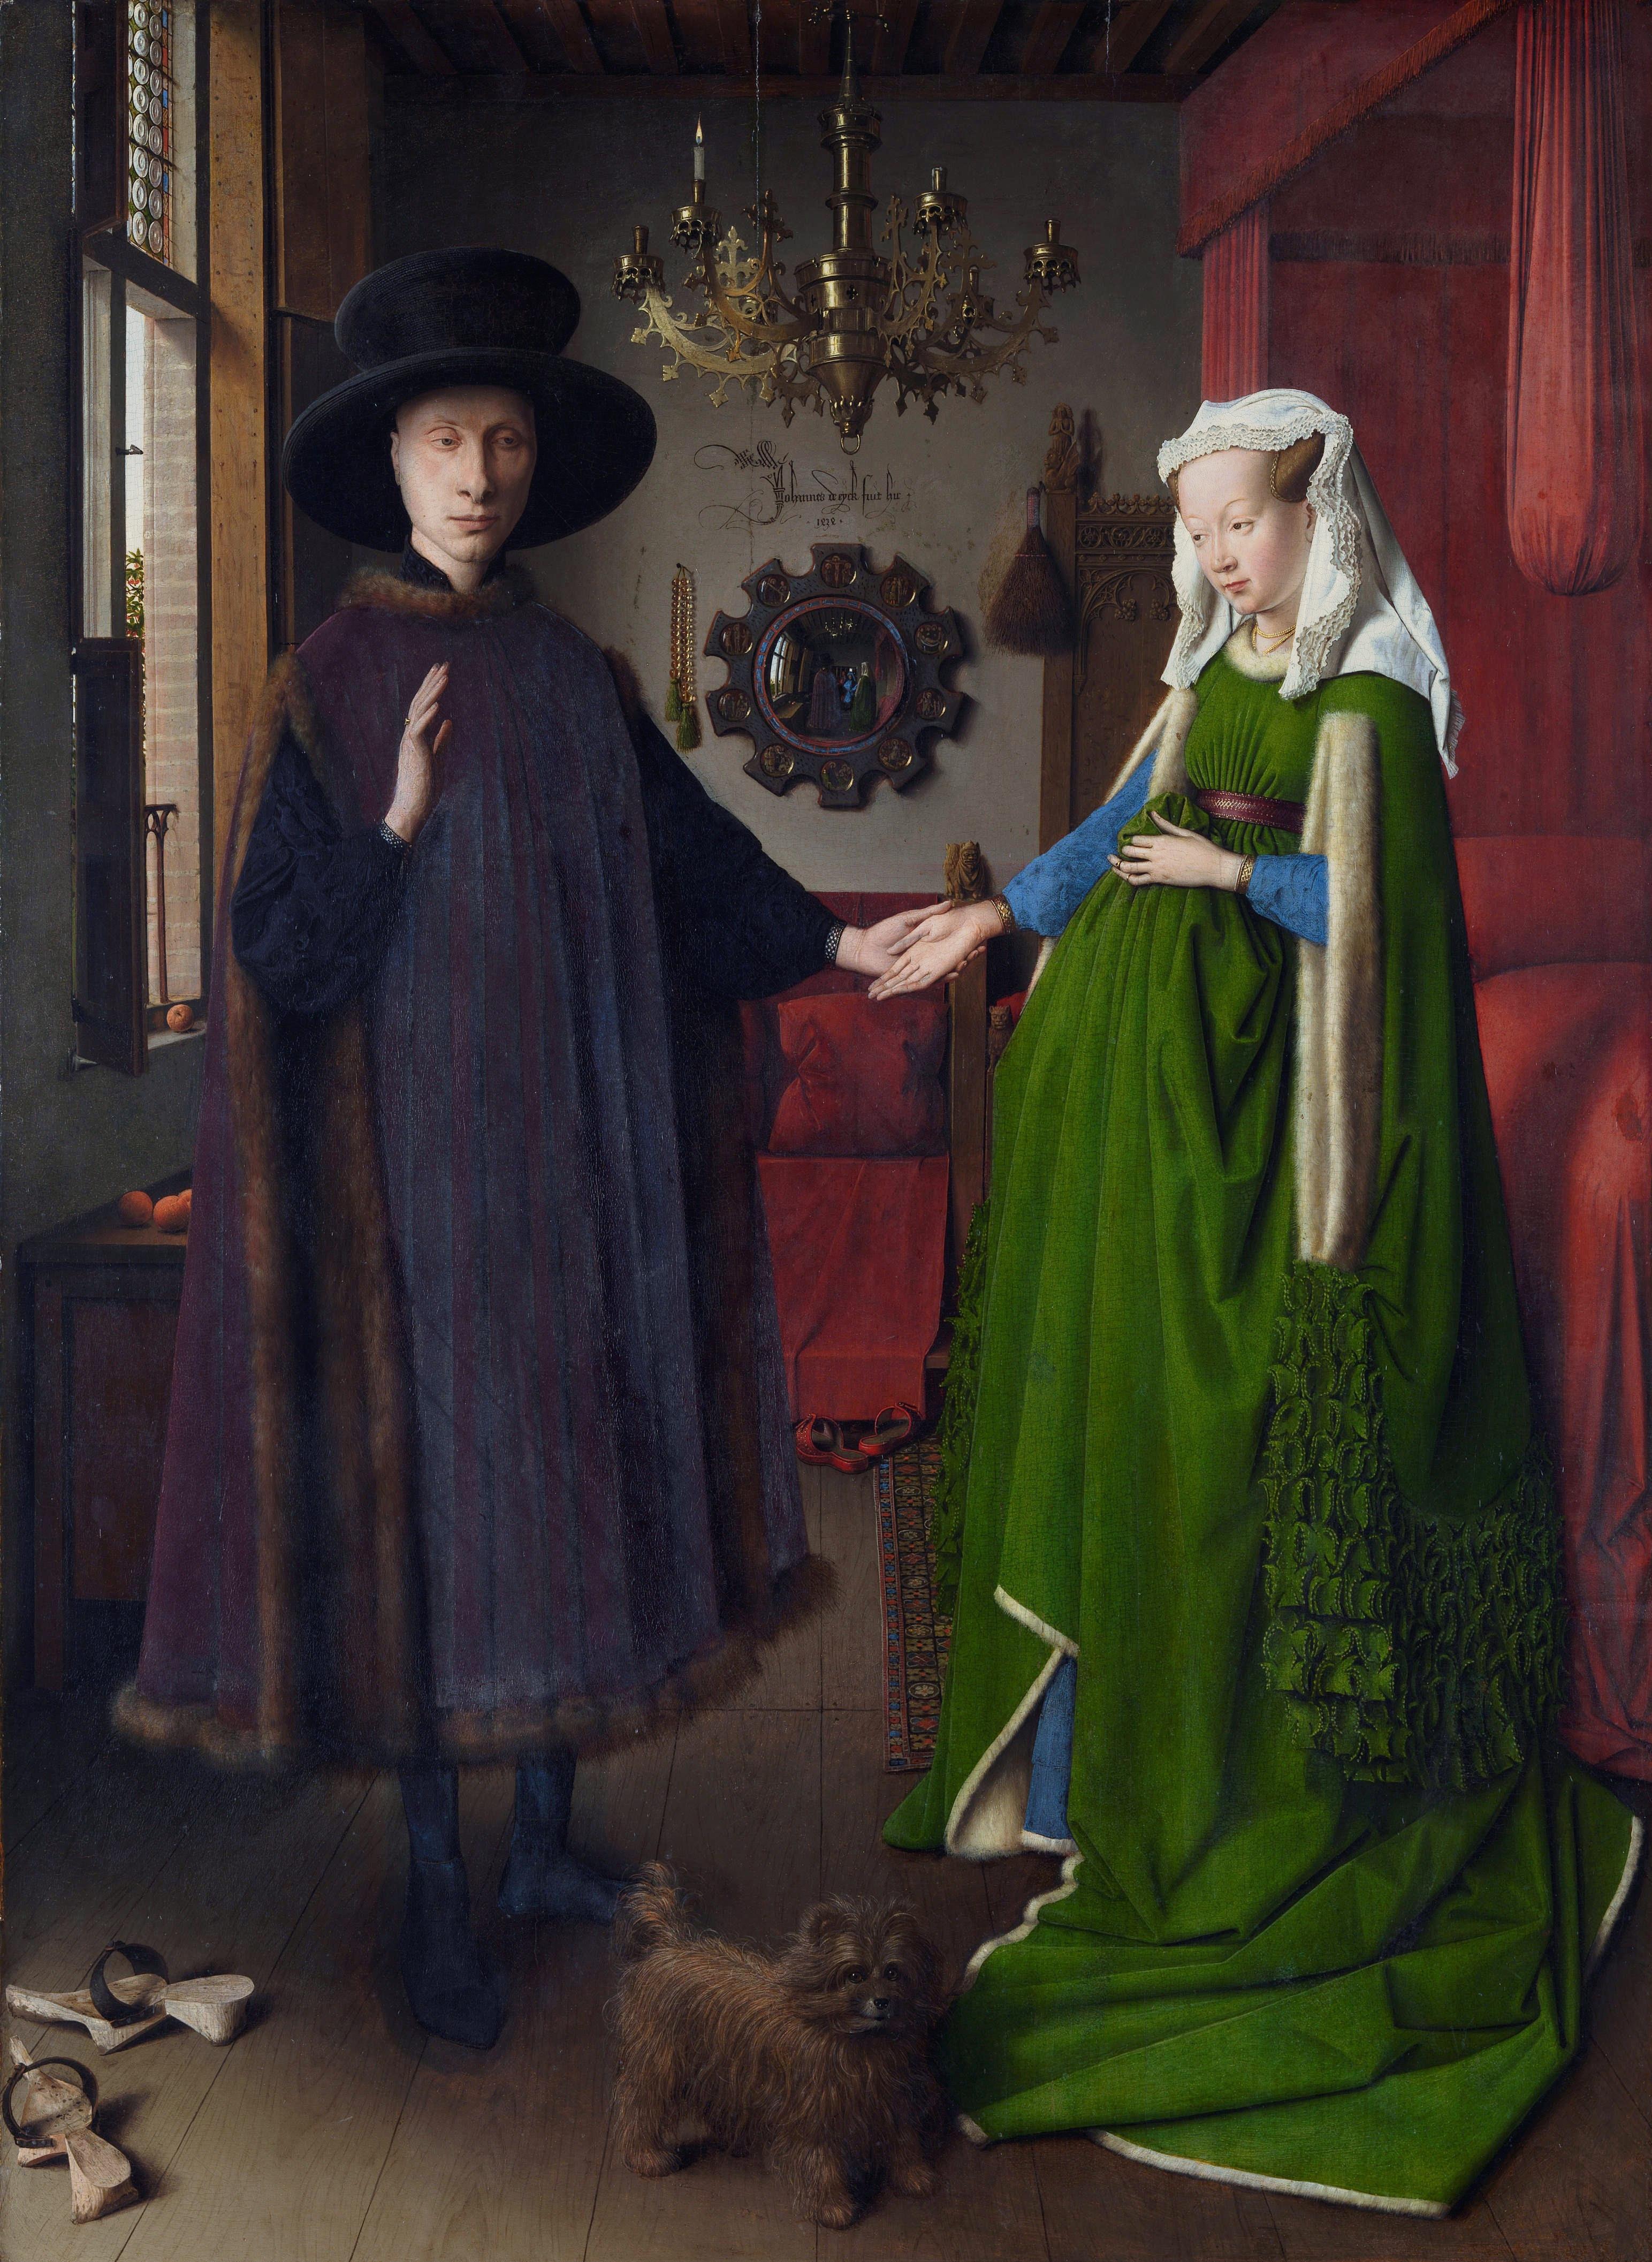 Arnolfini Wedding Portrait Controversy Essay - Part 2